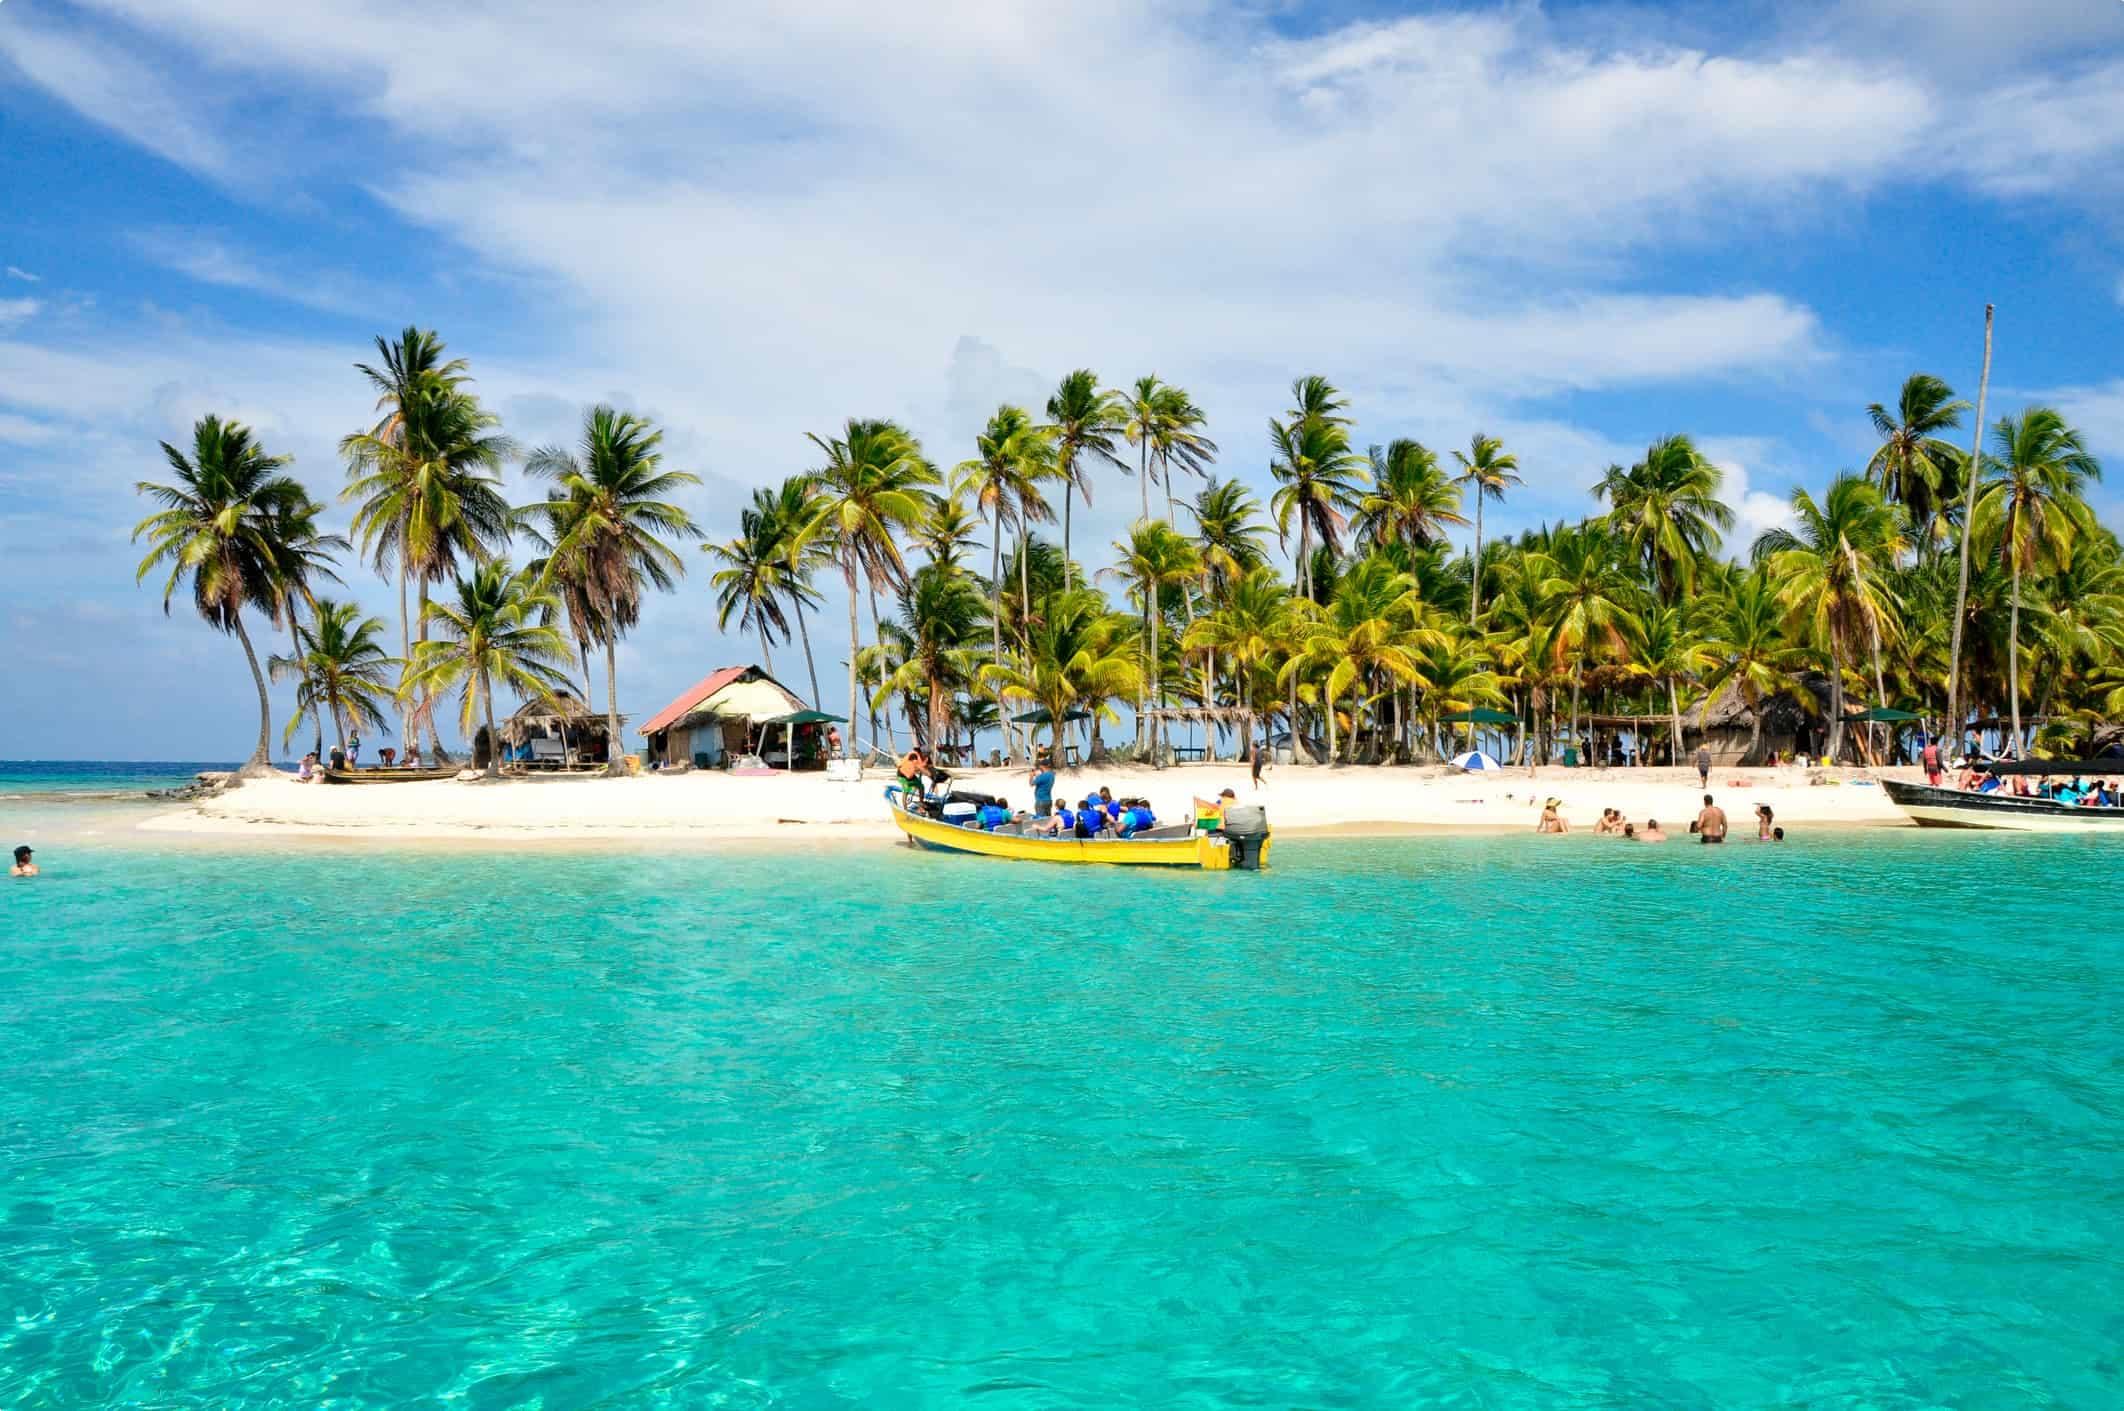 The clear waters of San Blas, Panama